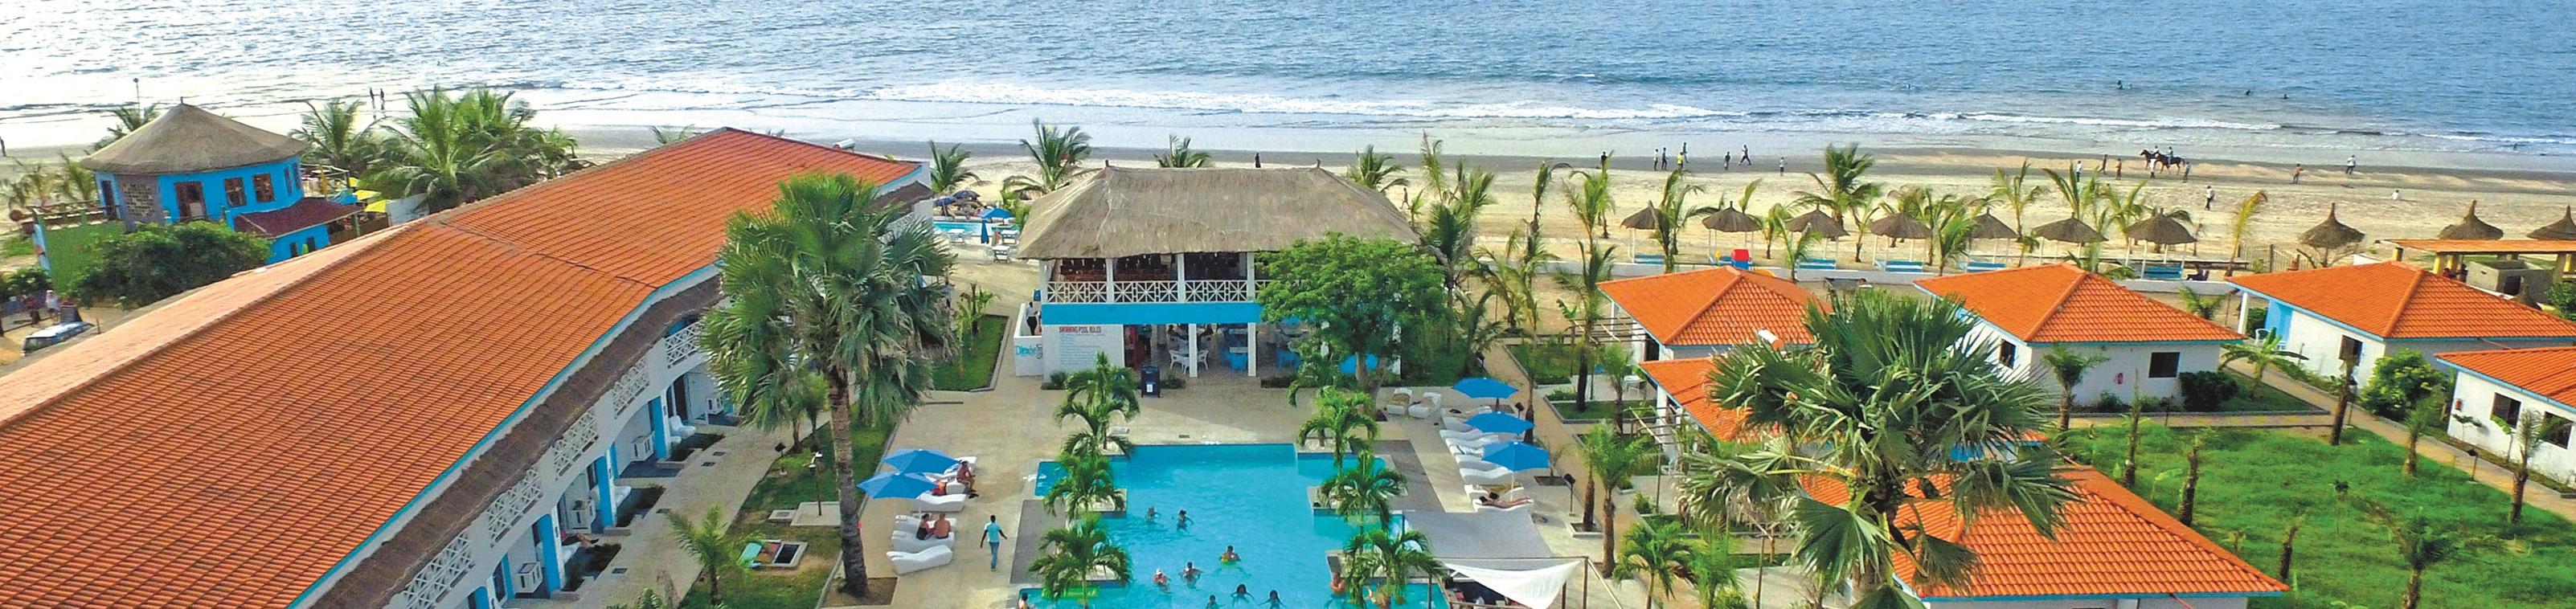 Djembe Beach Resort****